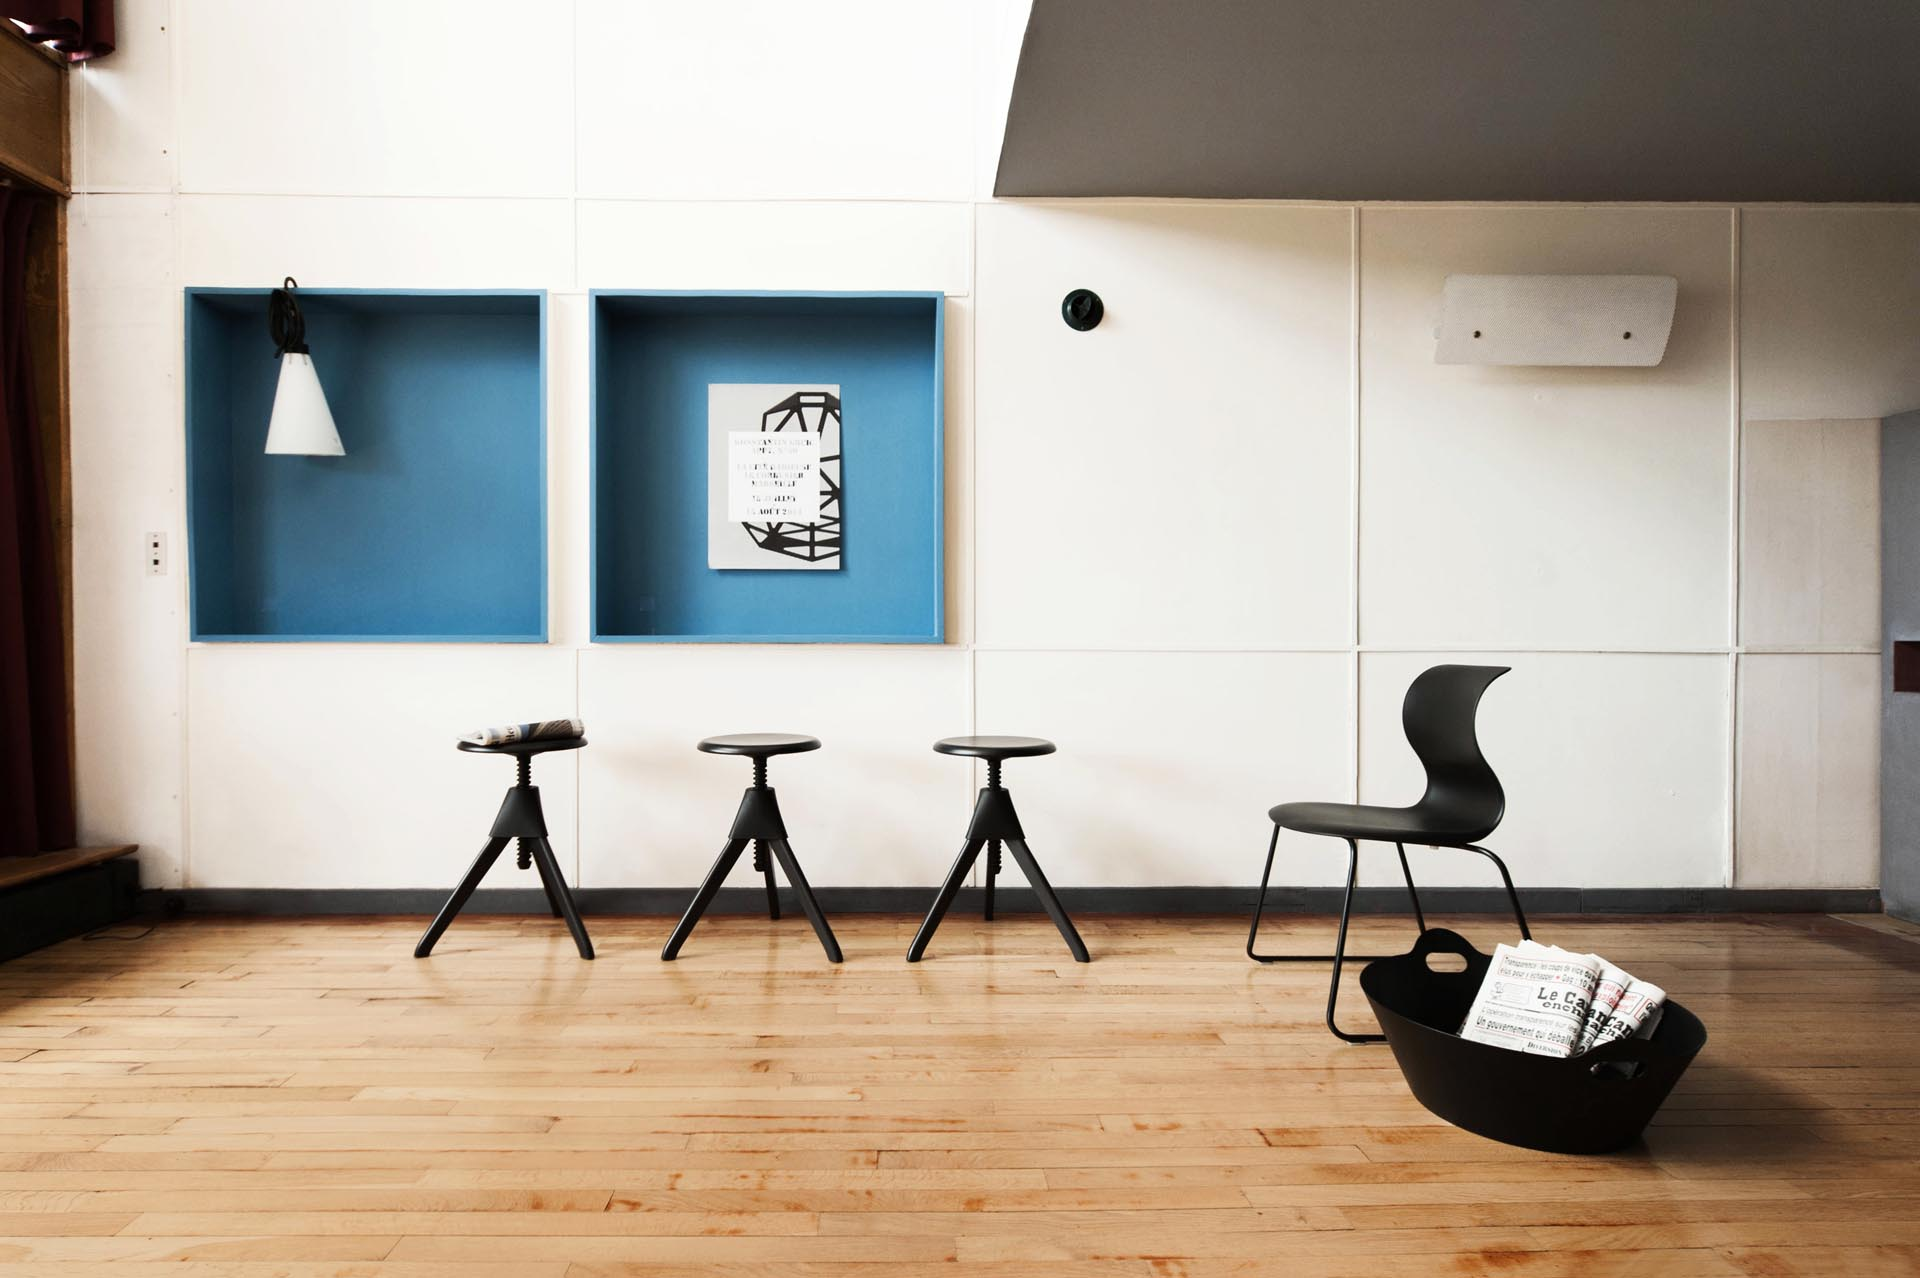 Connu Konstantin Grcic and Xavier Veilhan at Le Corbusier′s Unité - uncube HV19